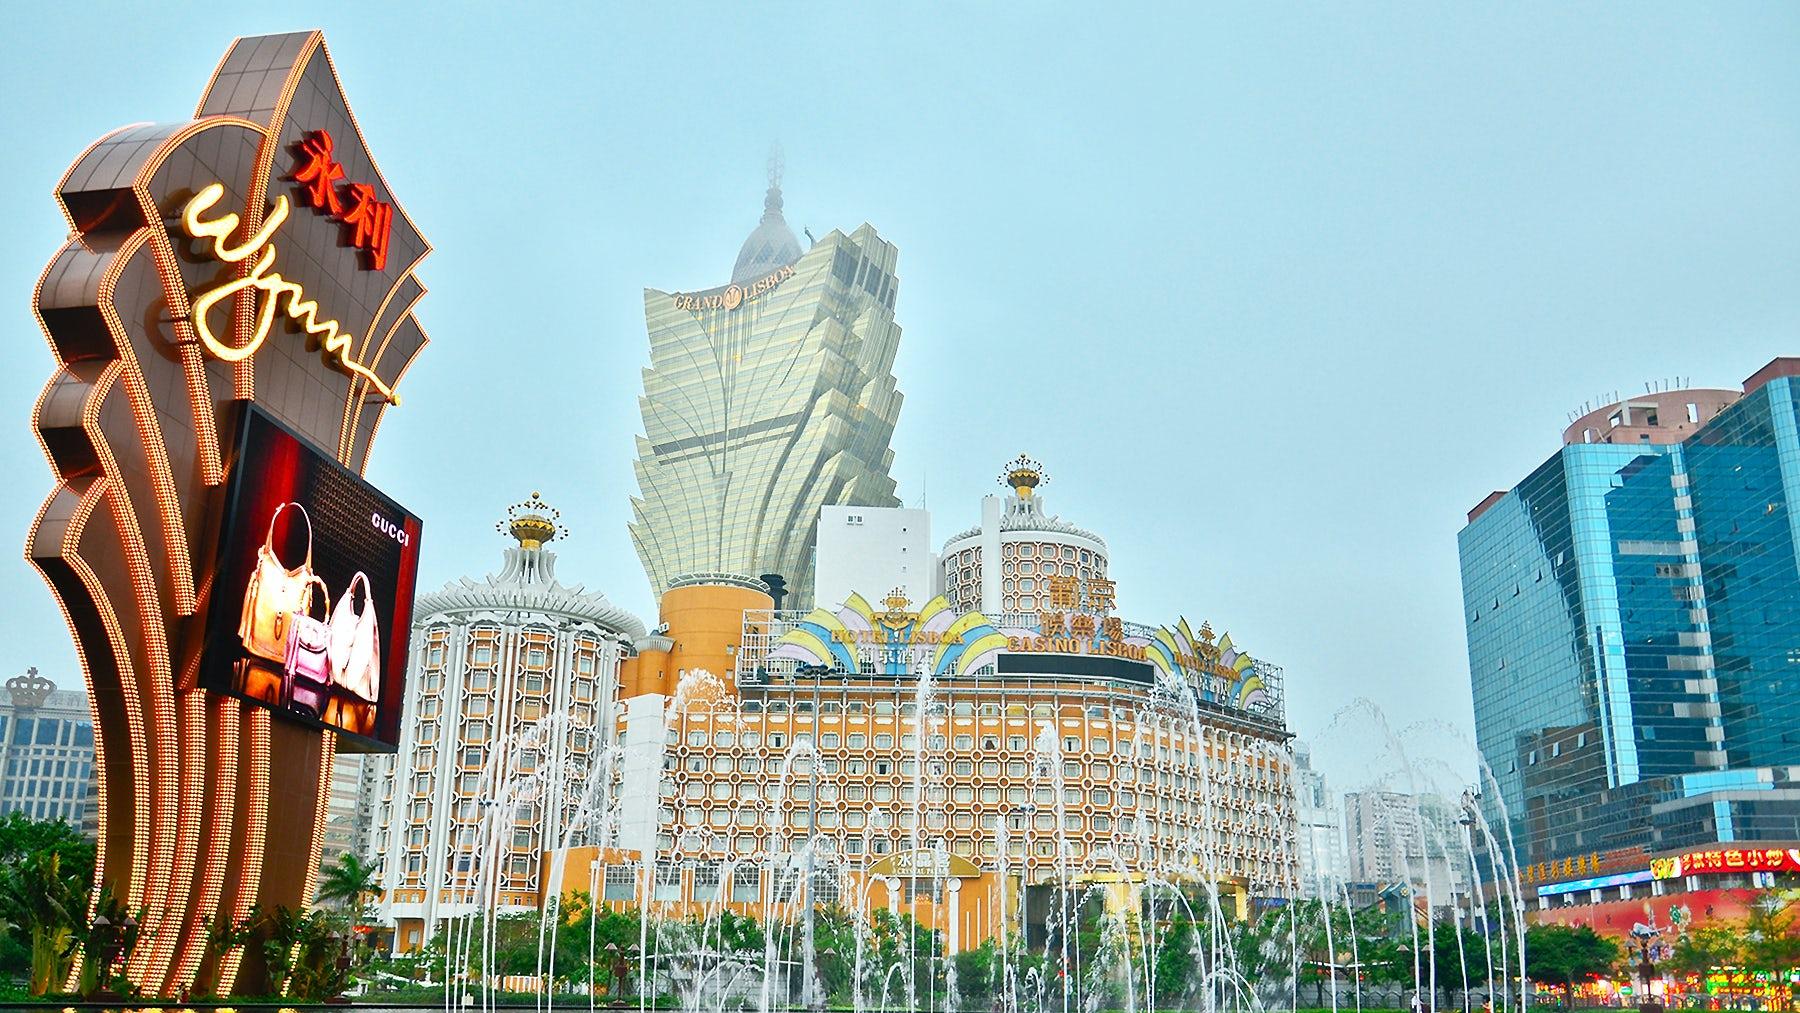 The Wynn Macau casino resort in Macau, China | Source: Shutterstock